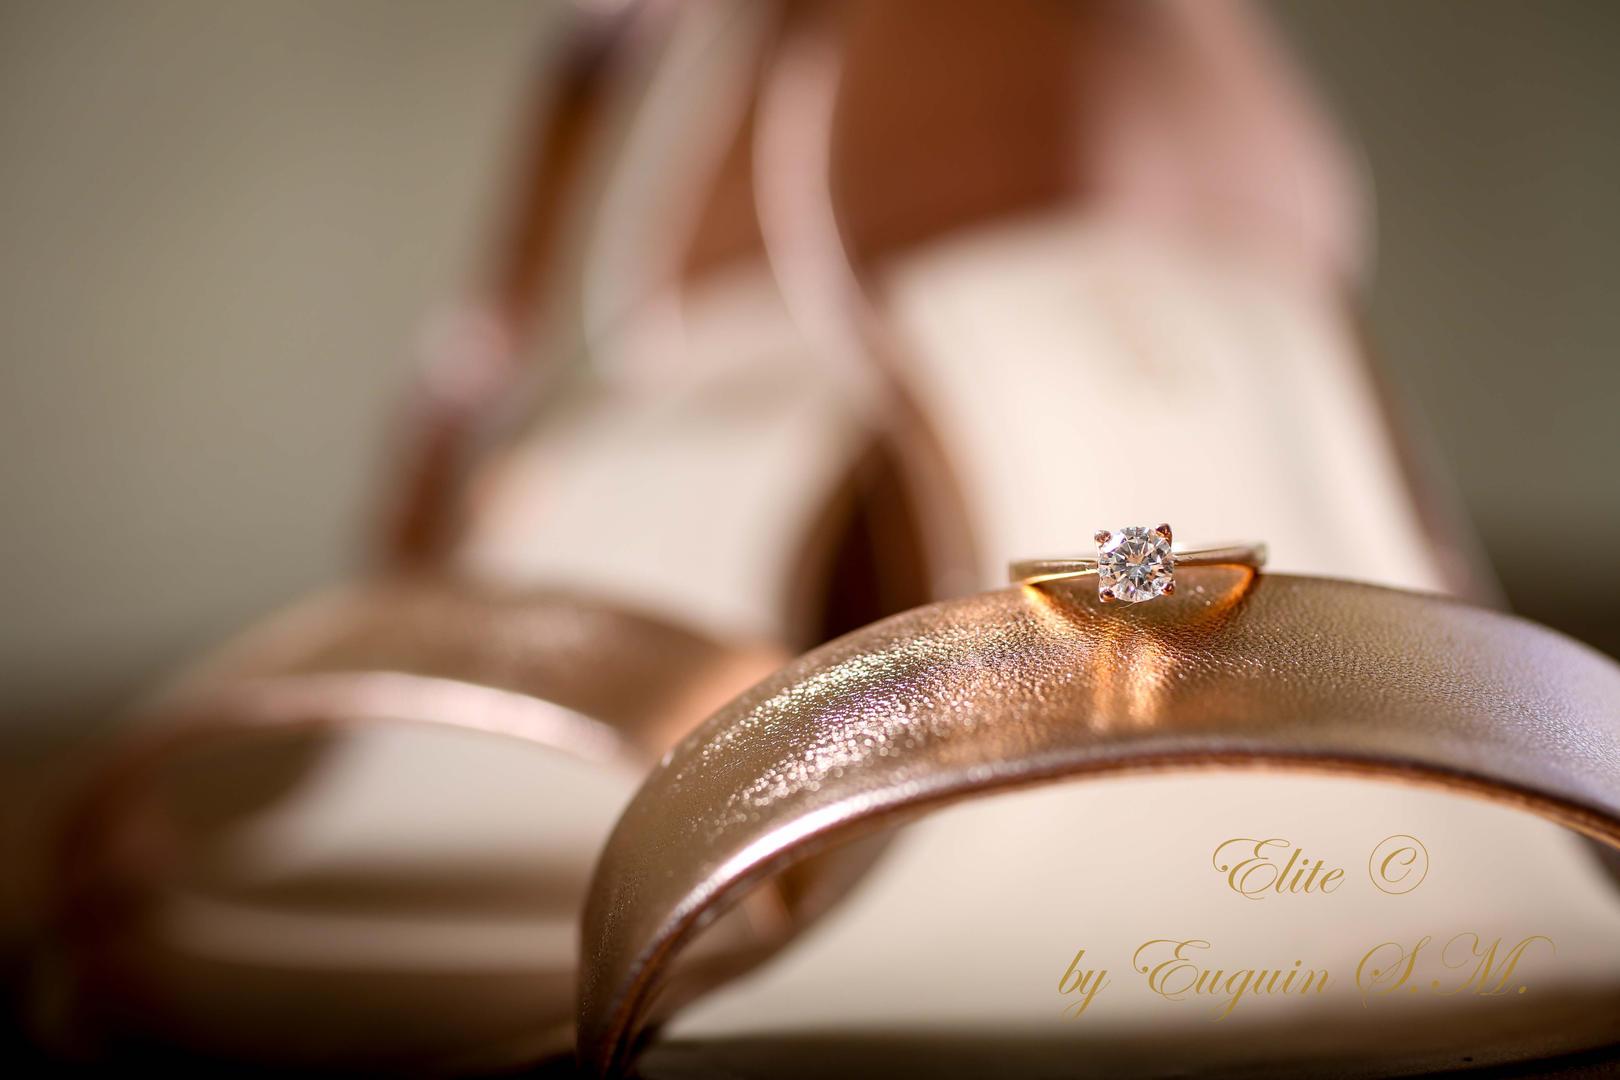 Real de Minas wedding venue Engagement ring getting ready wedding photography